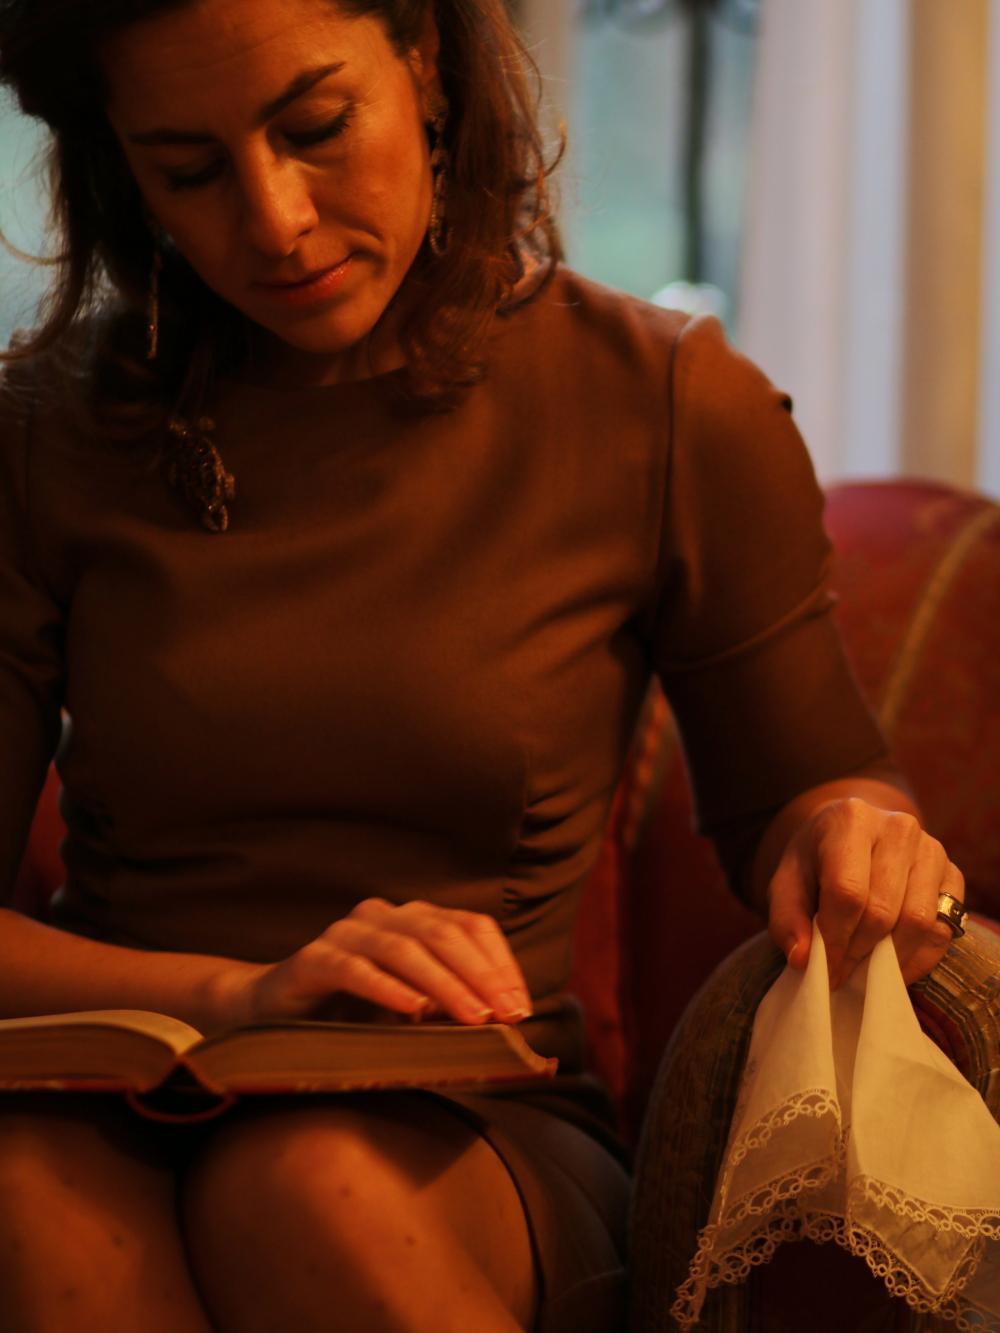 personal diaries annunciazione maria-teresa by The Italian Glam donna che legge